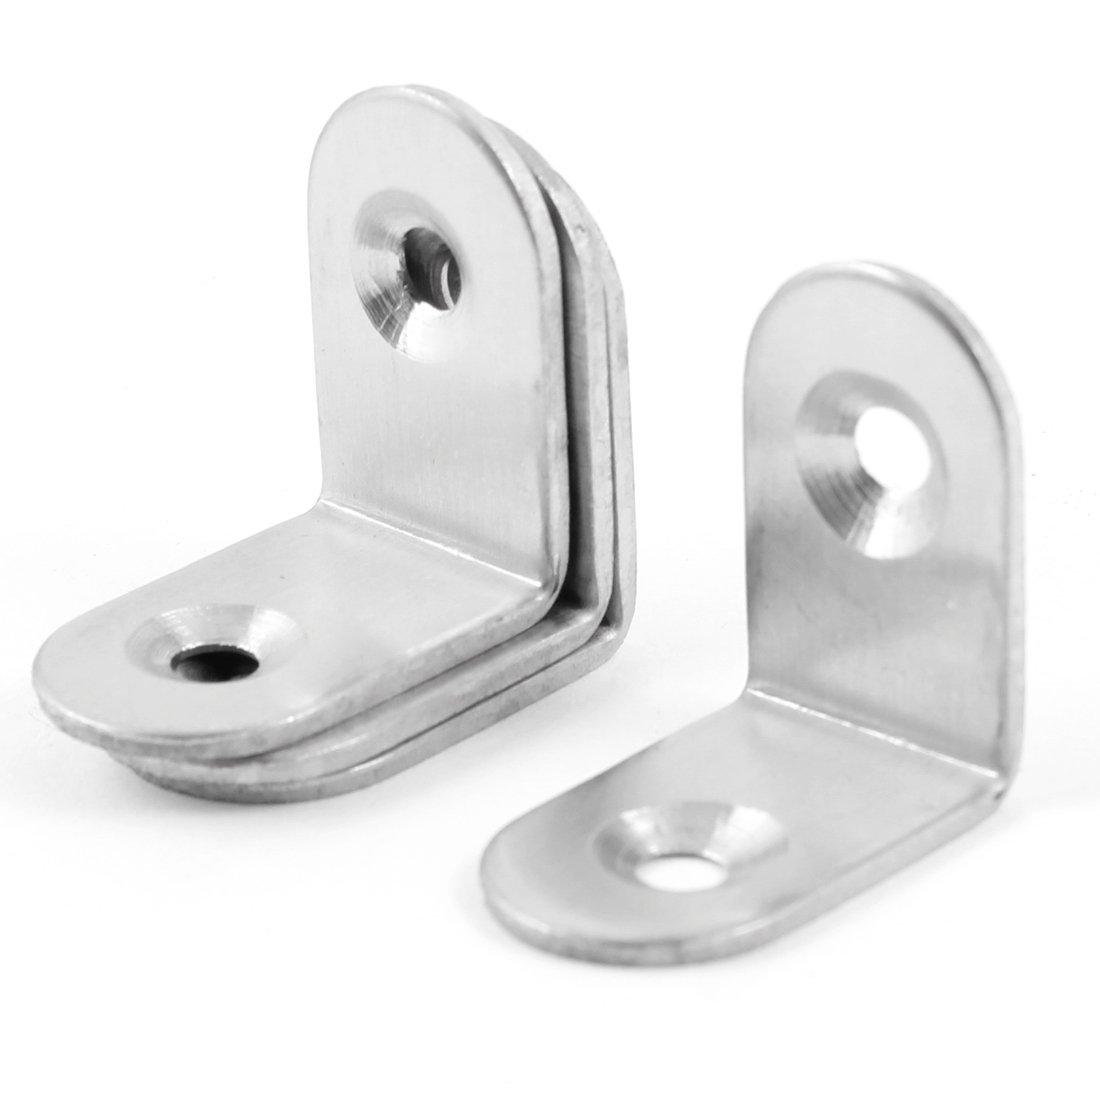 KSOL Bracket - Furniture Shelf 20x20x15mm L Shaped 25 pieces/25 x 25 mm, 4 pcs Angle Brackets Supports clip  цена и фото